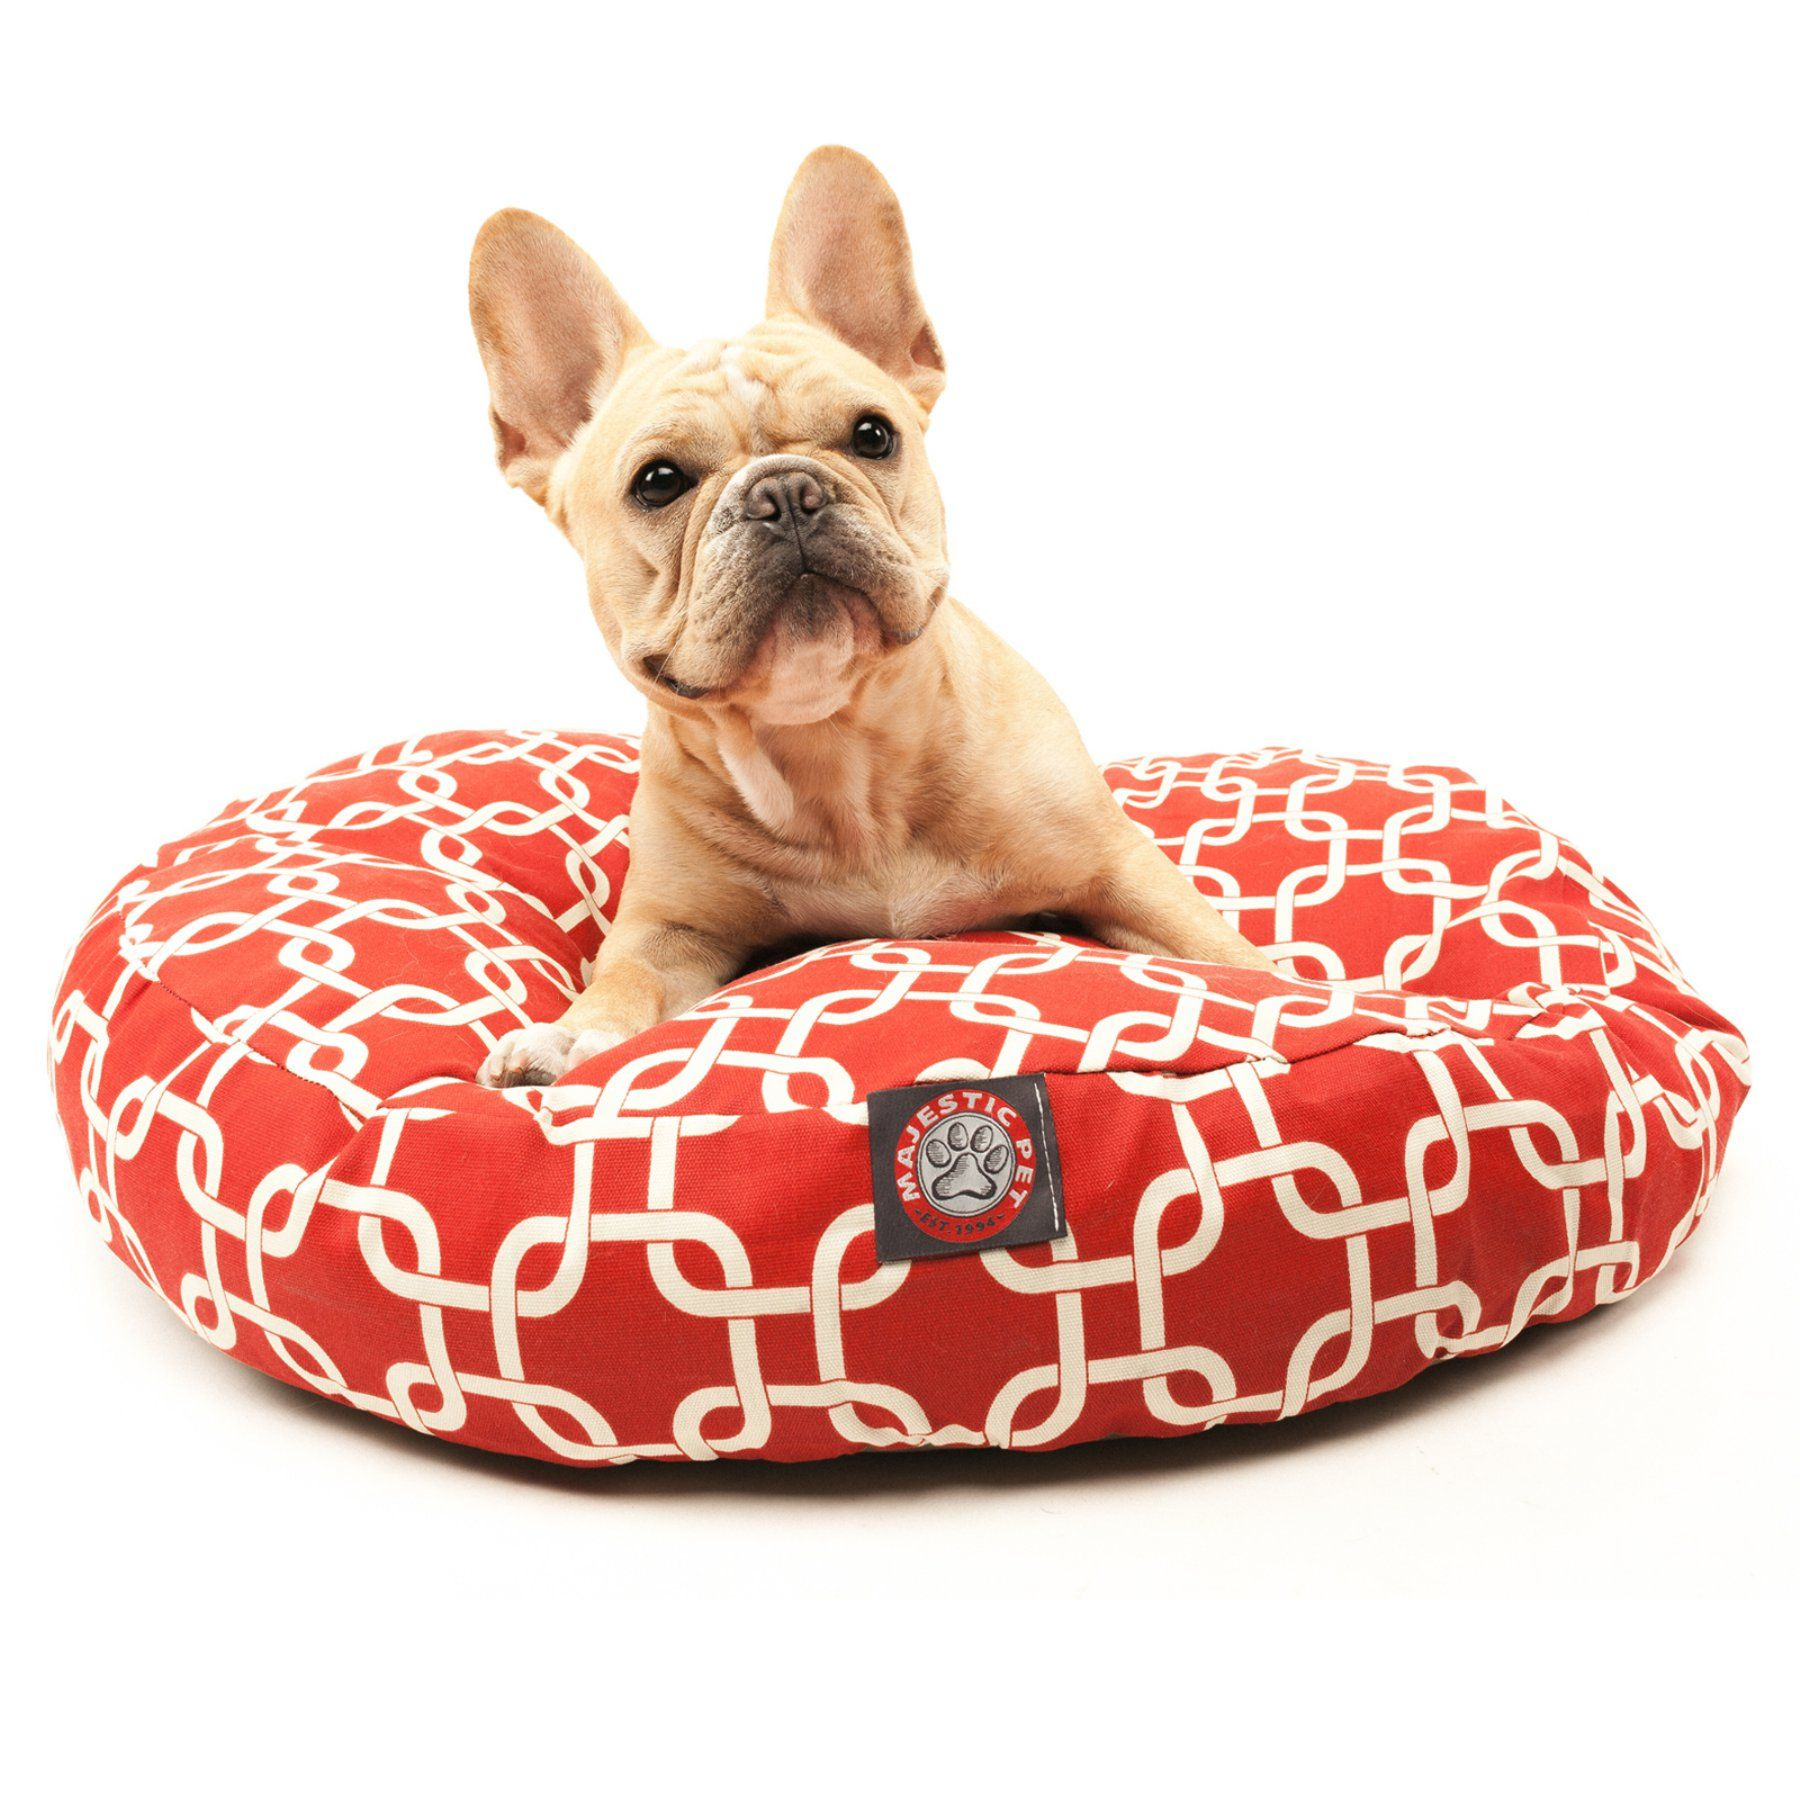 Superb Majestic Pet Links Round Pet Bed 78899550628 Products Creativecarmelina Interior Chair Design Creativecarmelinacom